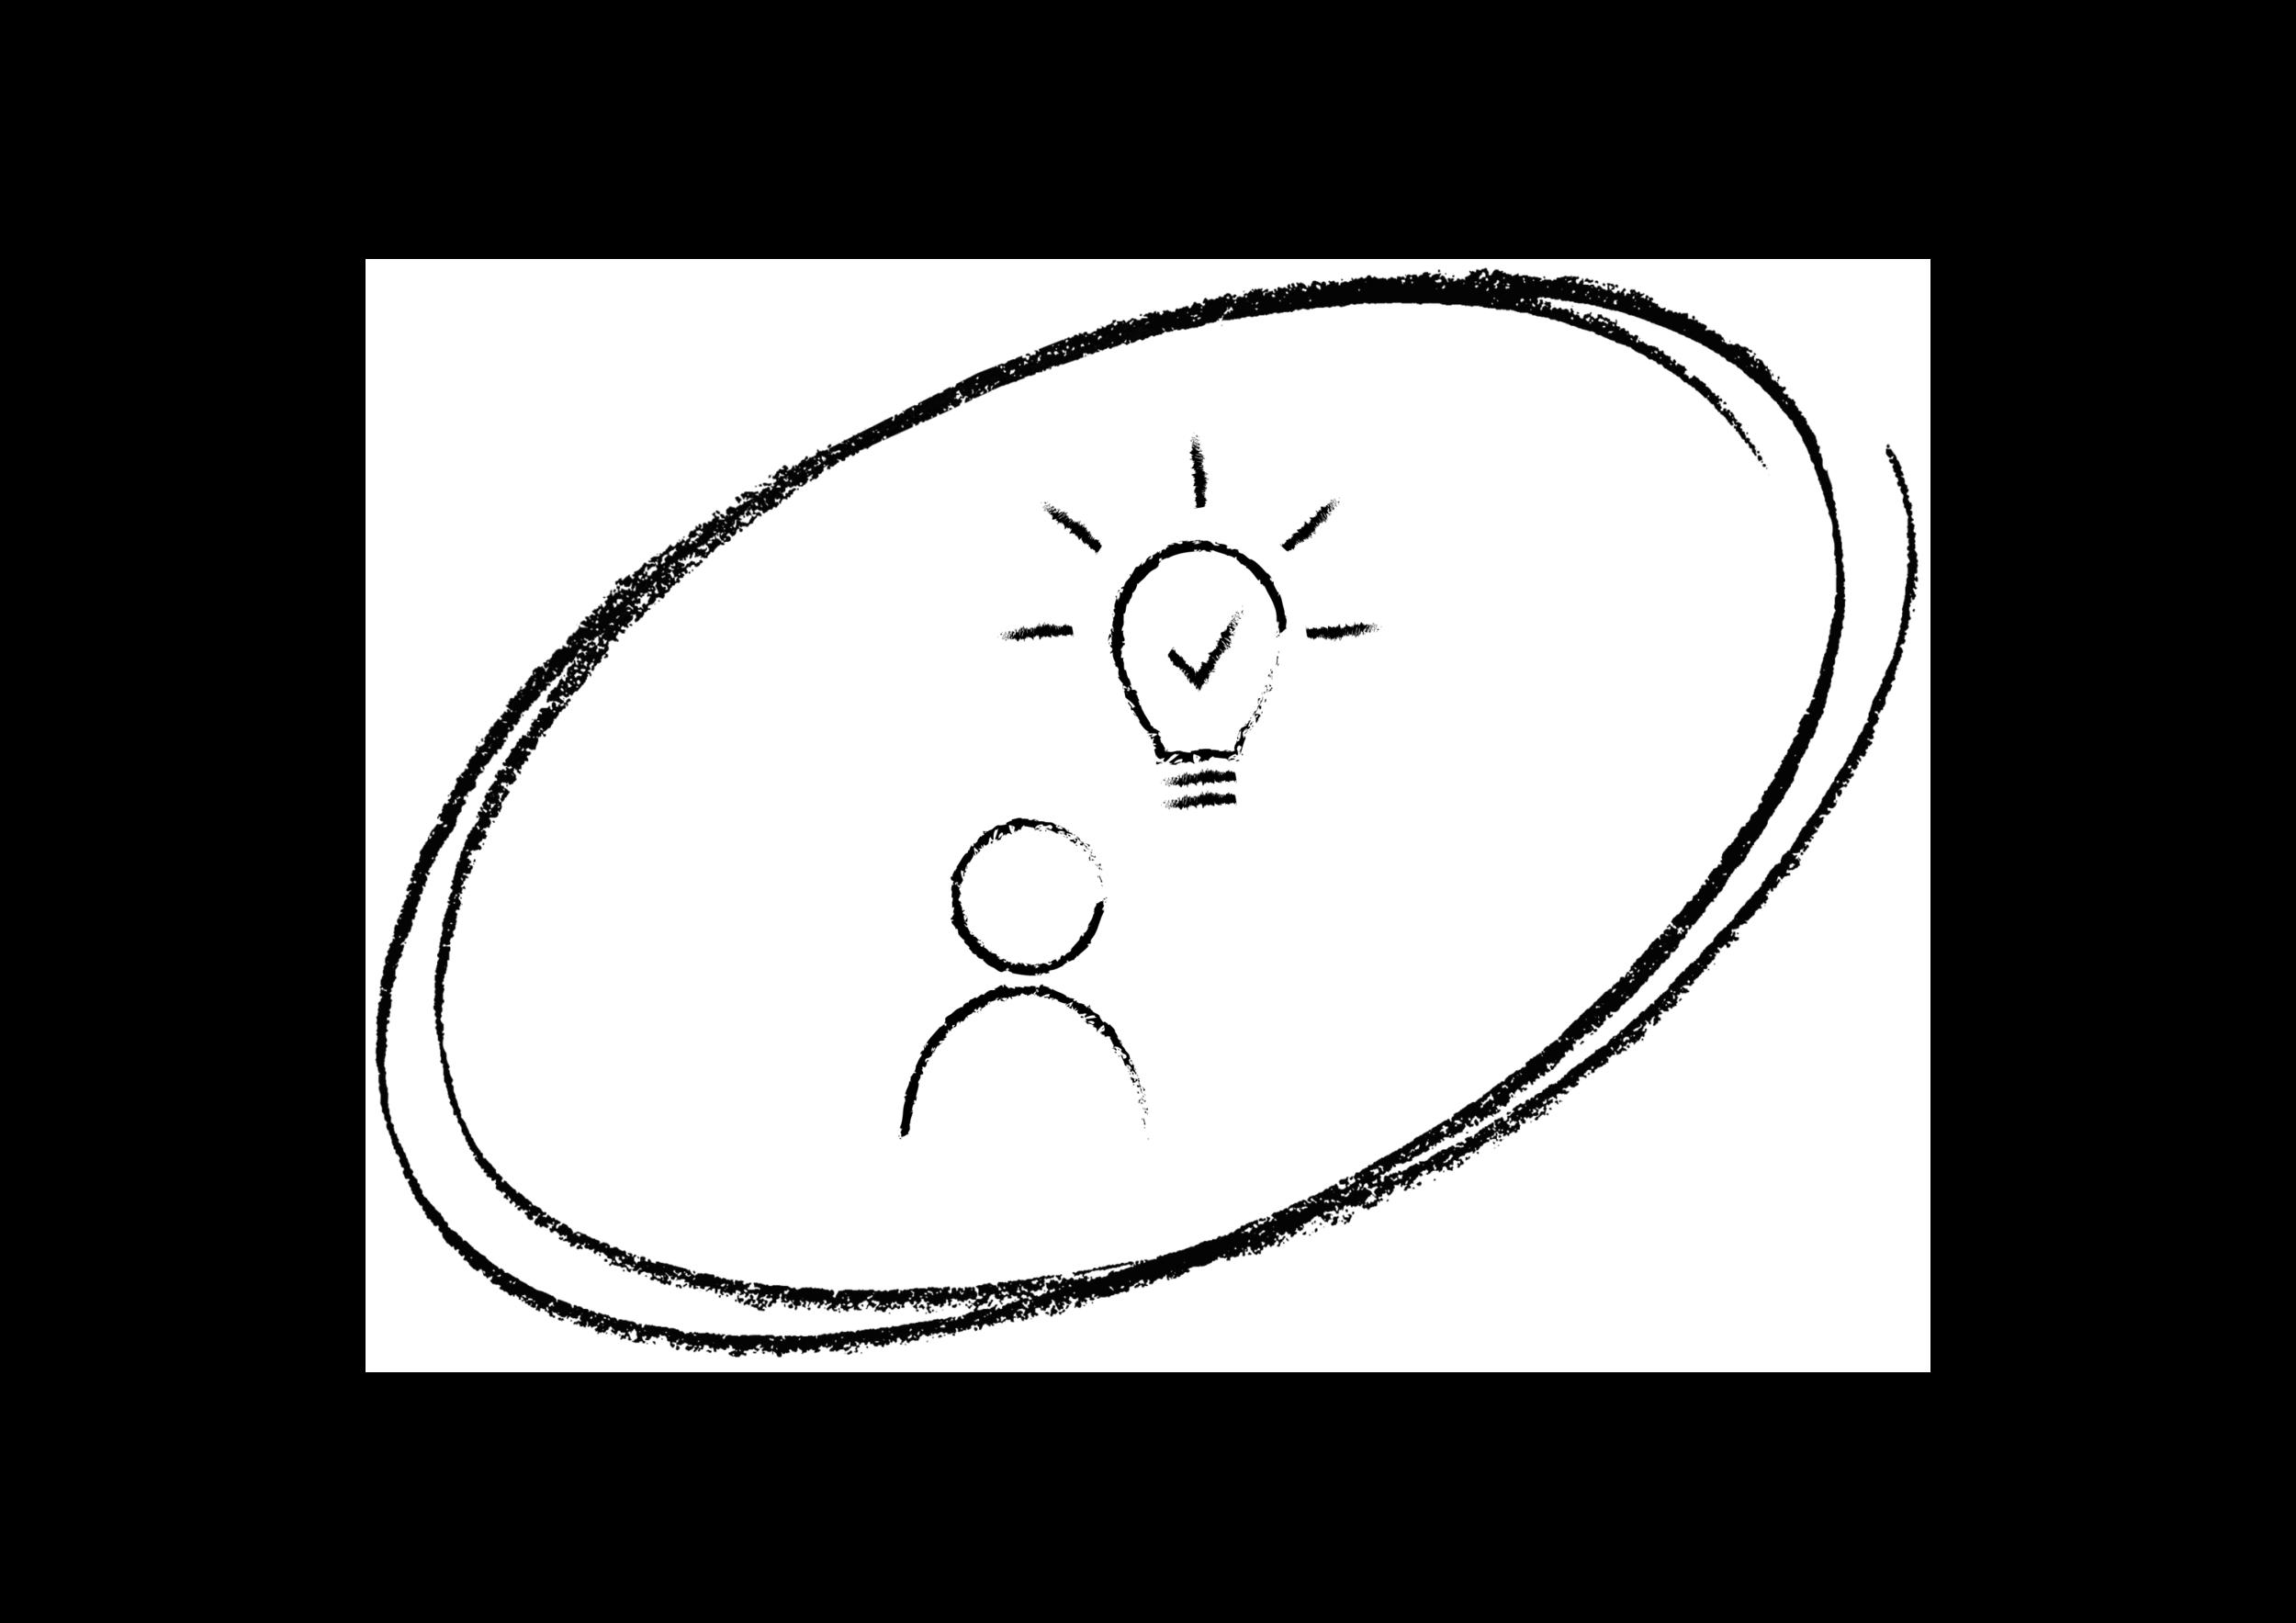 analytic-thinking-ModerationundIdeen.png